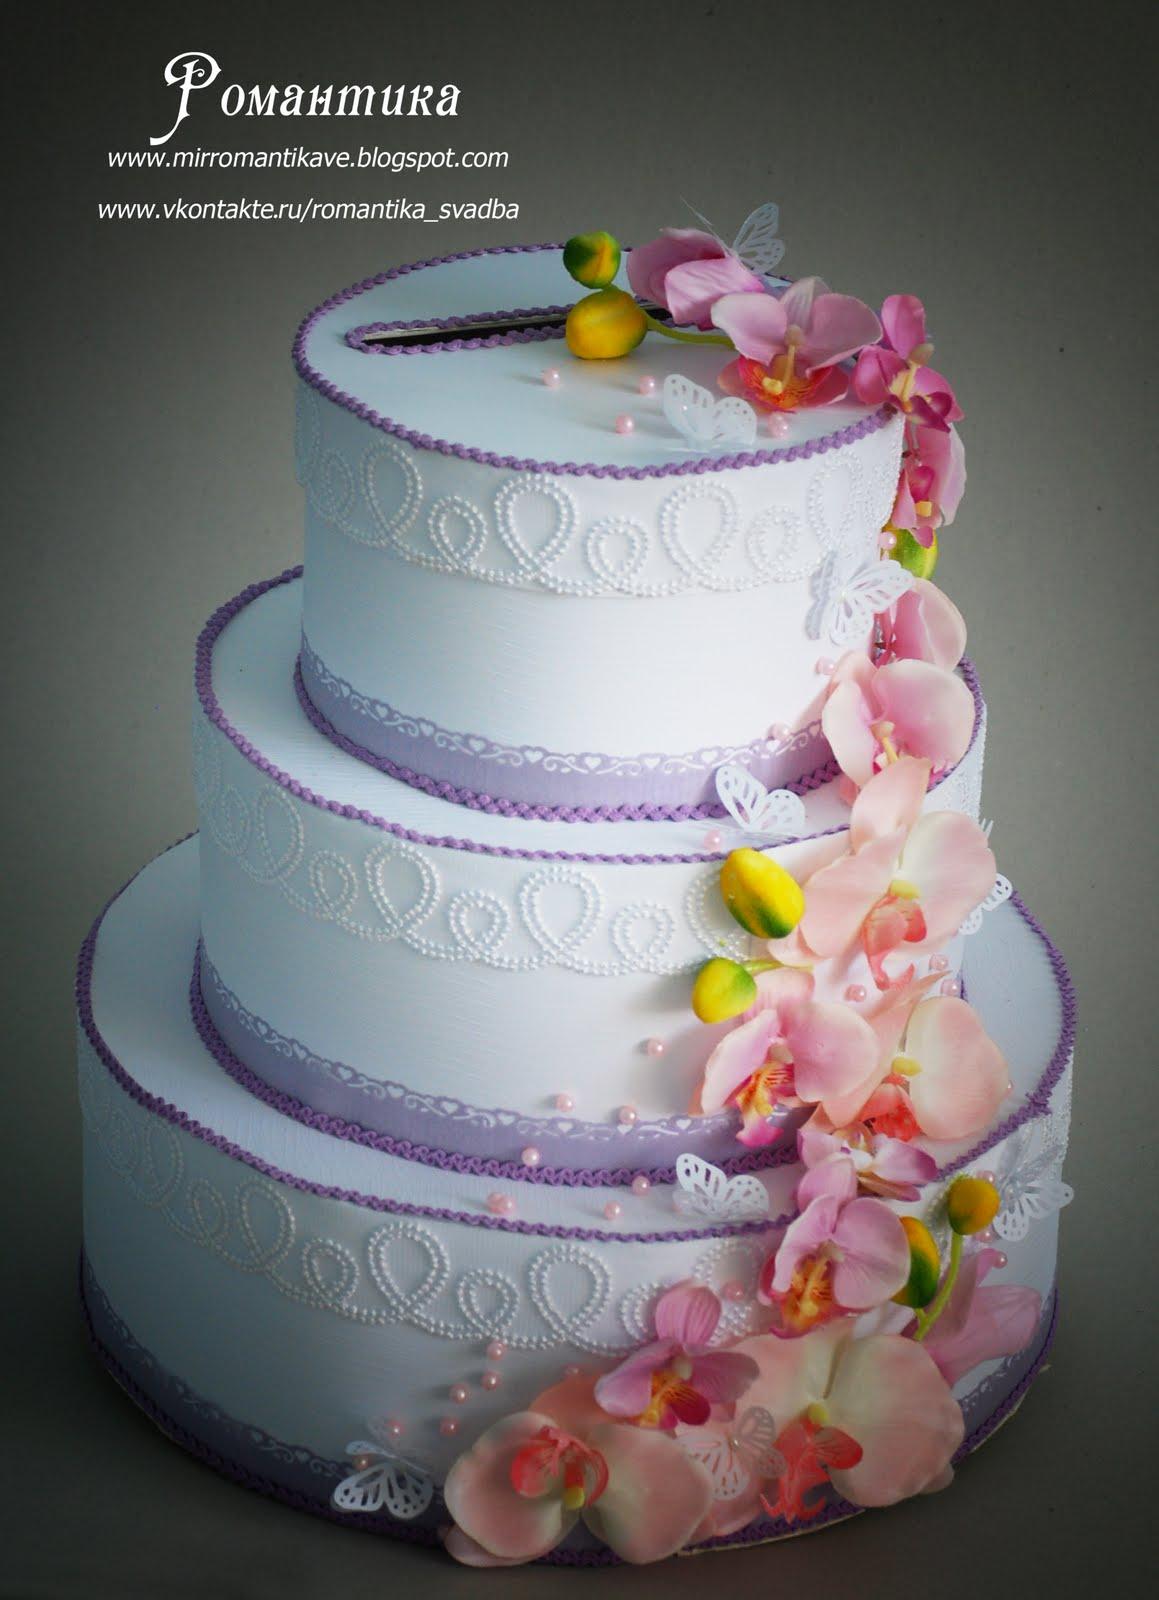 Казна торт на свадьбу своими руками мастер класс